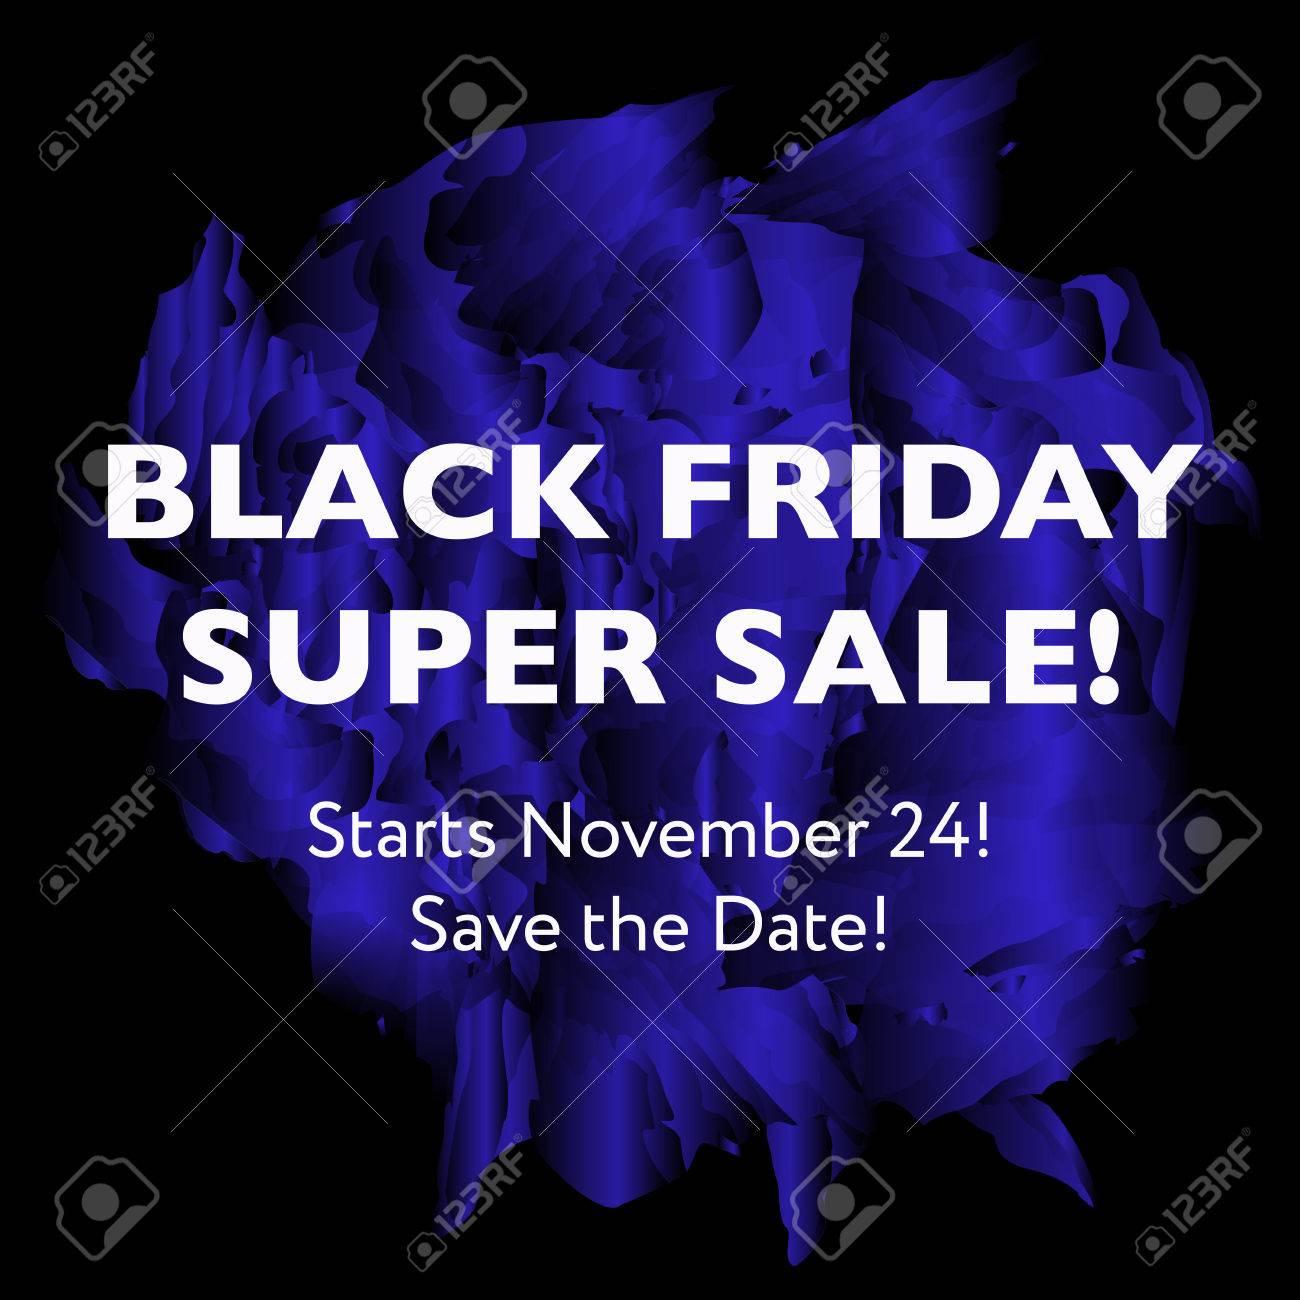 22f62f7432 Black Friday Super Sale concept. Shopping sale or promo poster and frame  leaflet or web